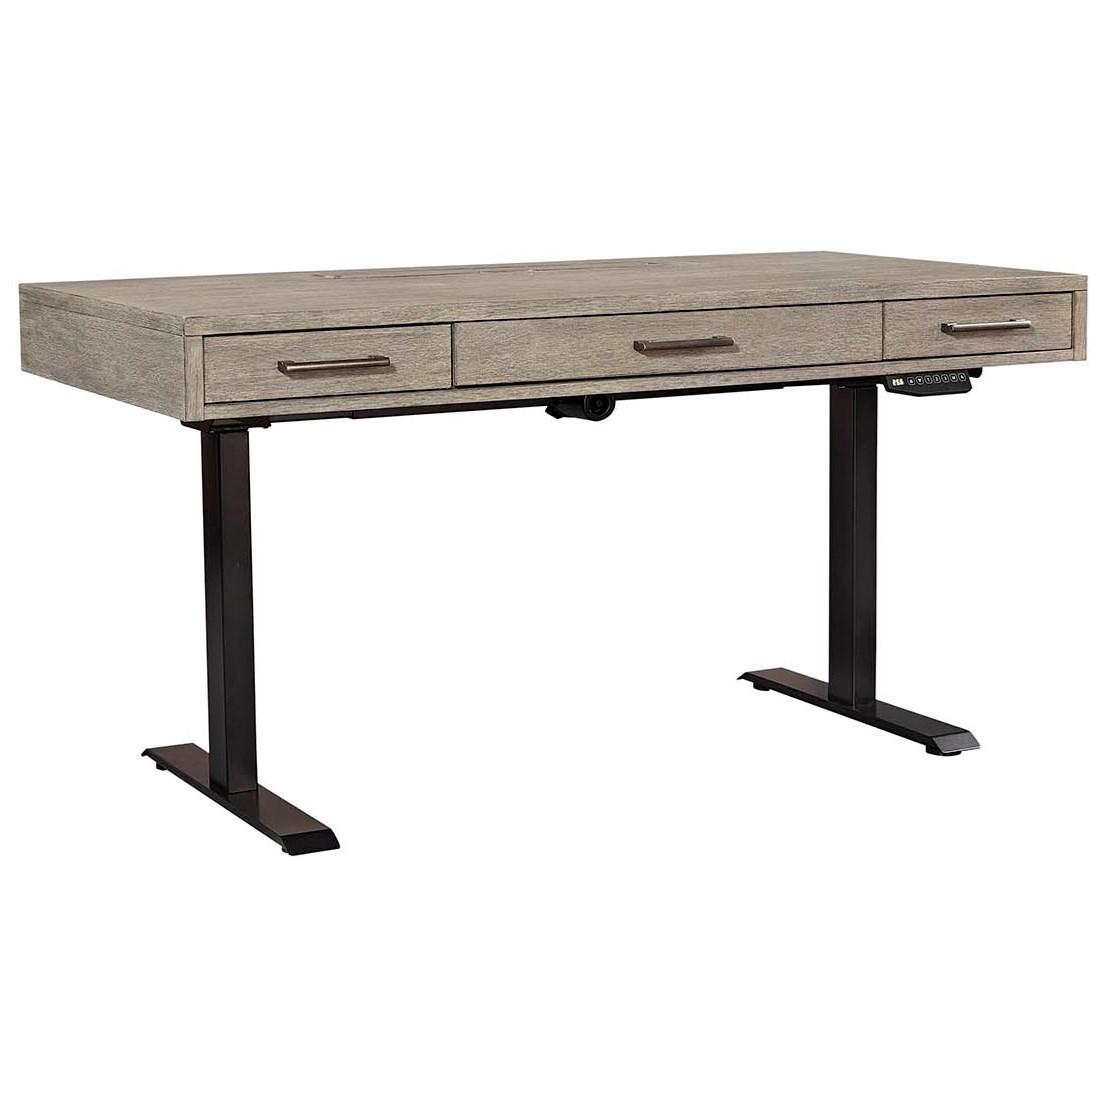 Platinum Adjustable Height Desk by Aspenhome at Stoney Creek Furniture